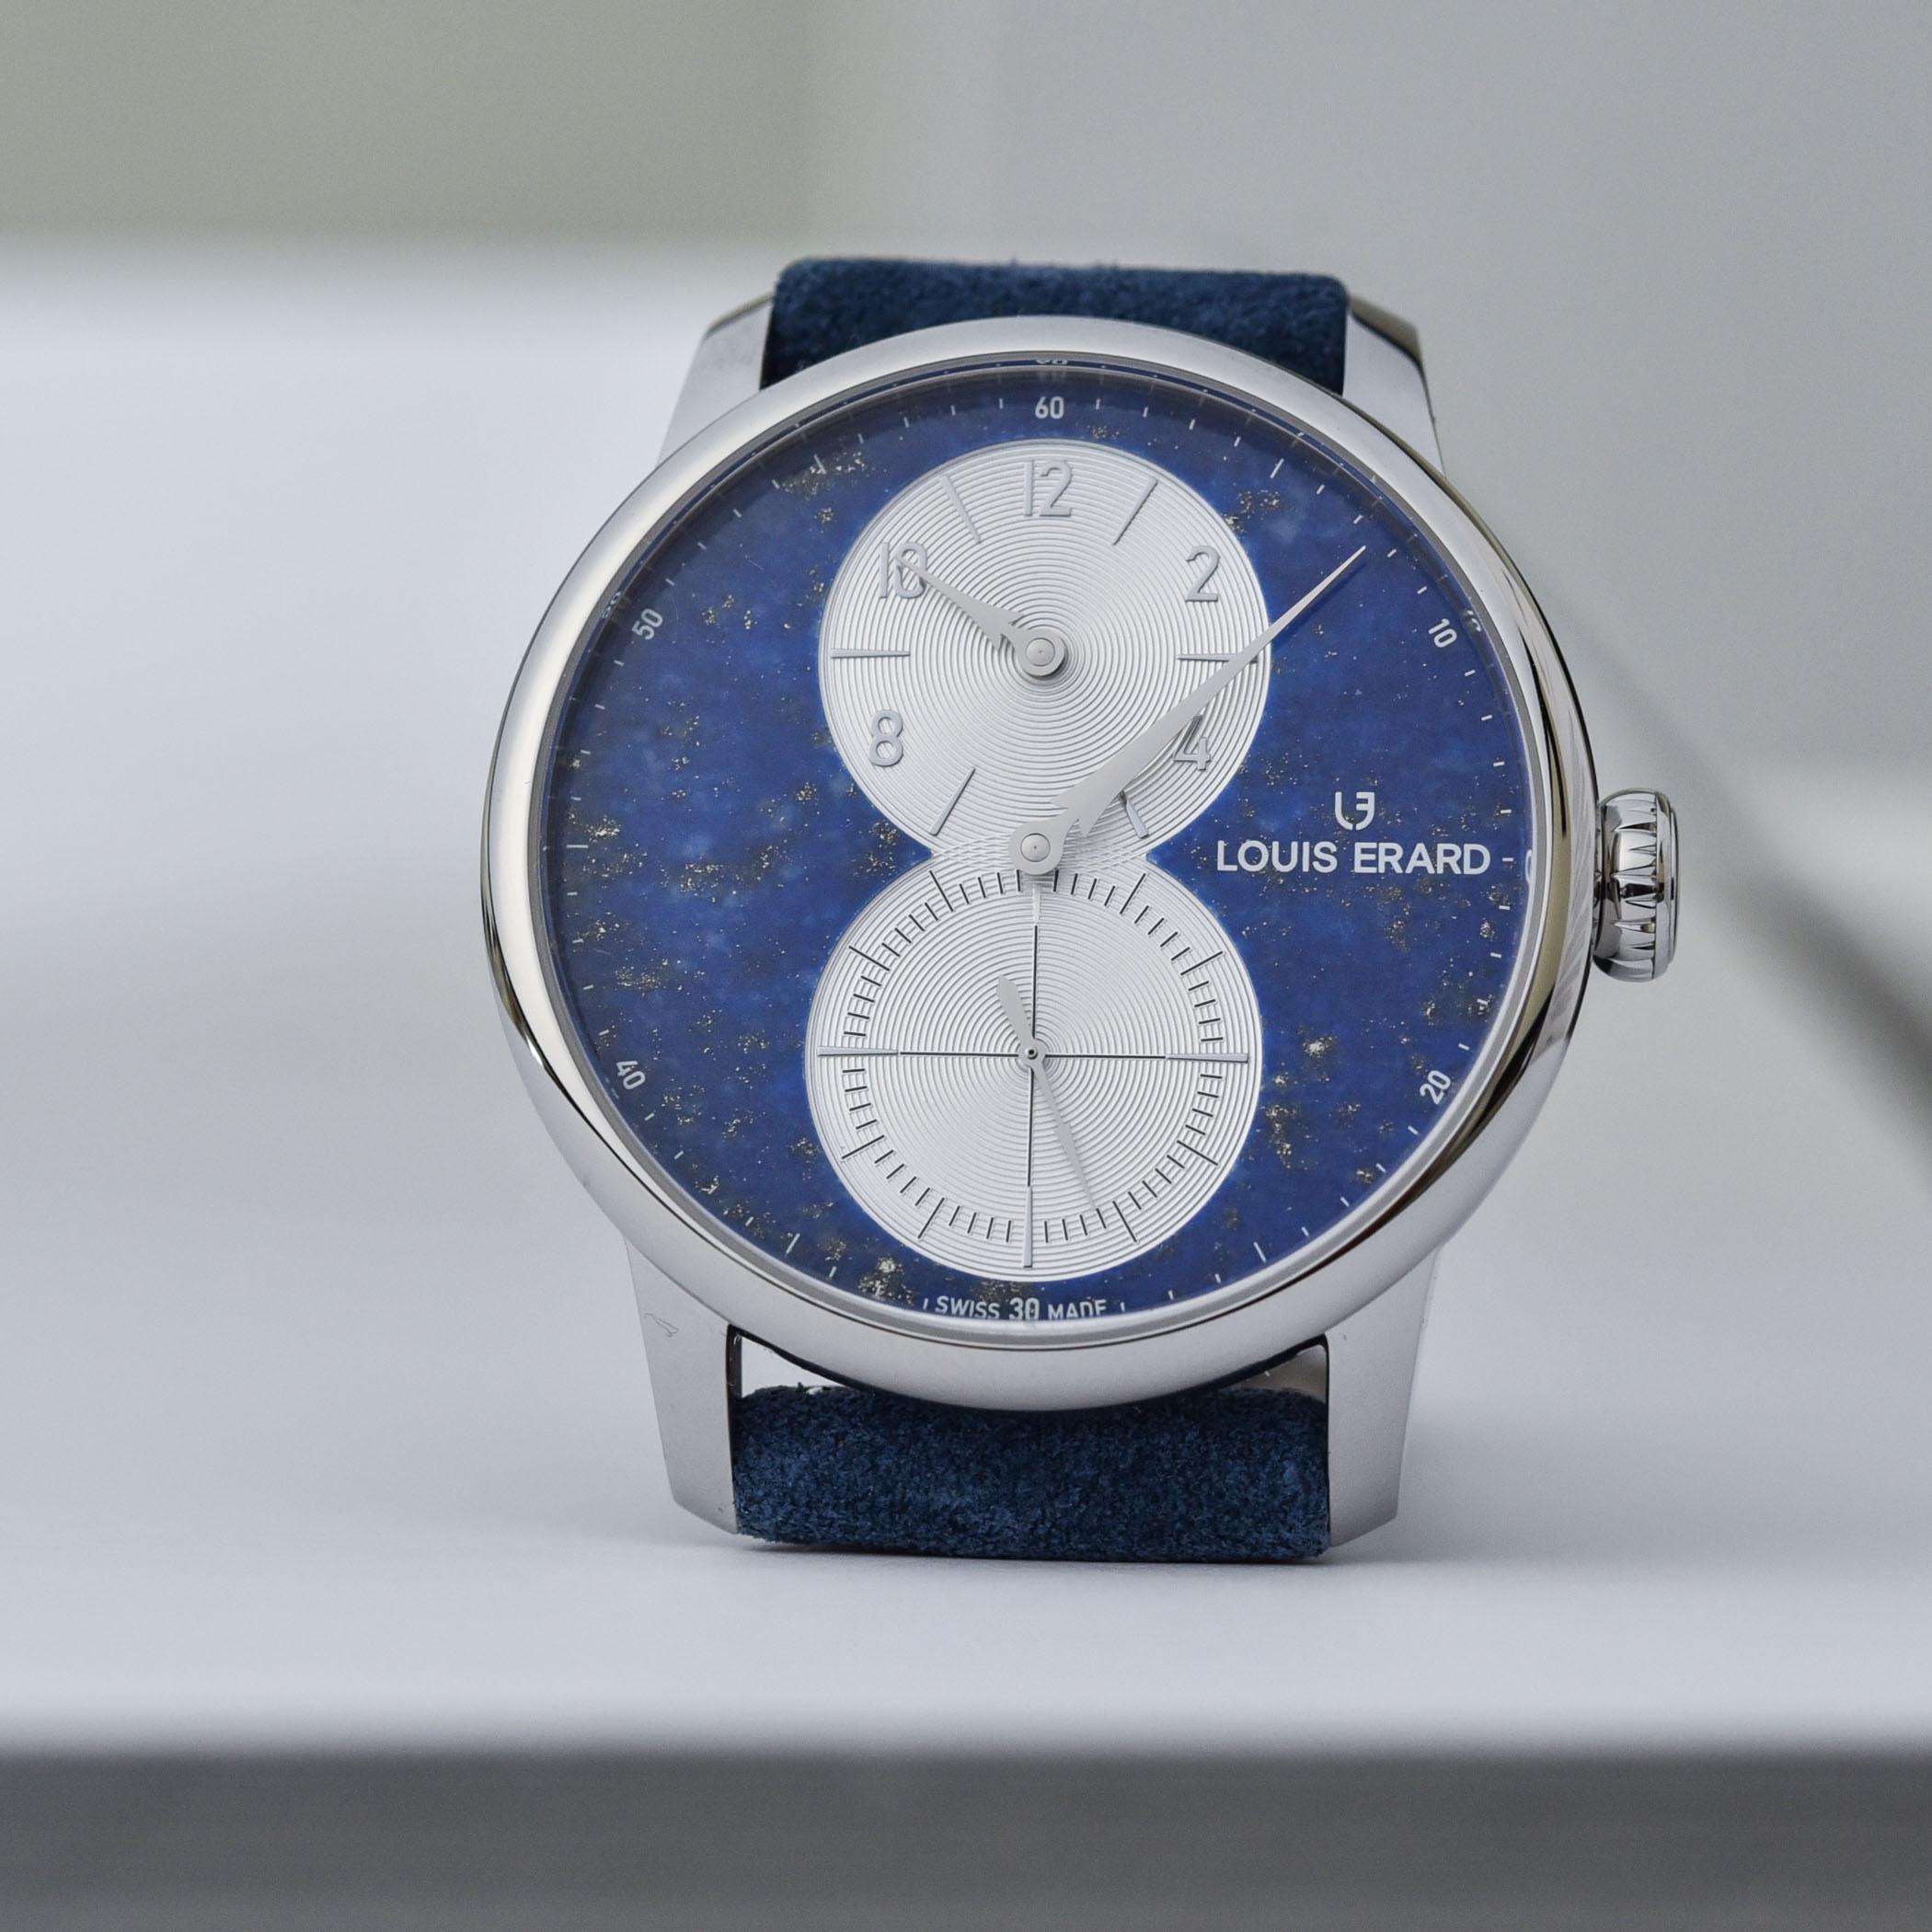 Louis Erard Excellence Regulateur Aventurine Lapis-Lazuli Malachite limited edition